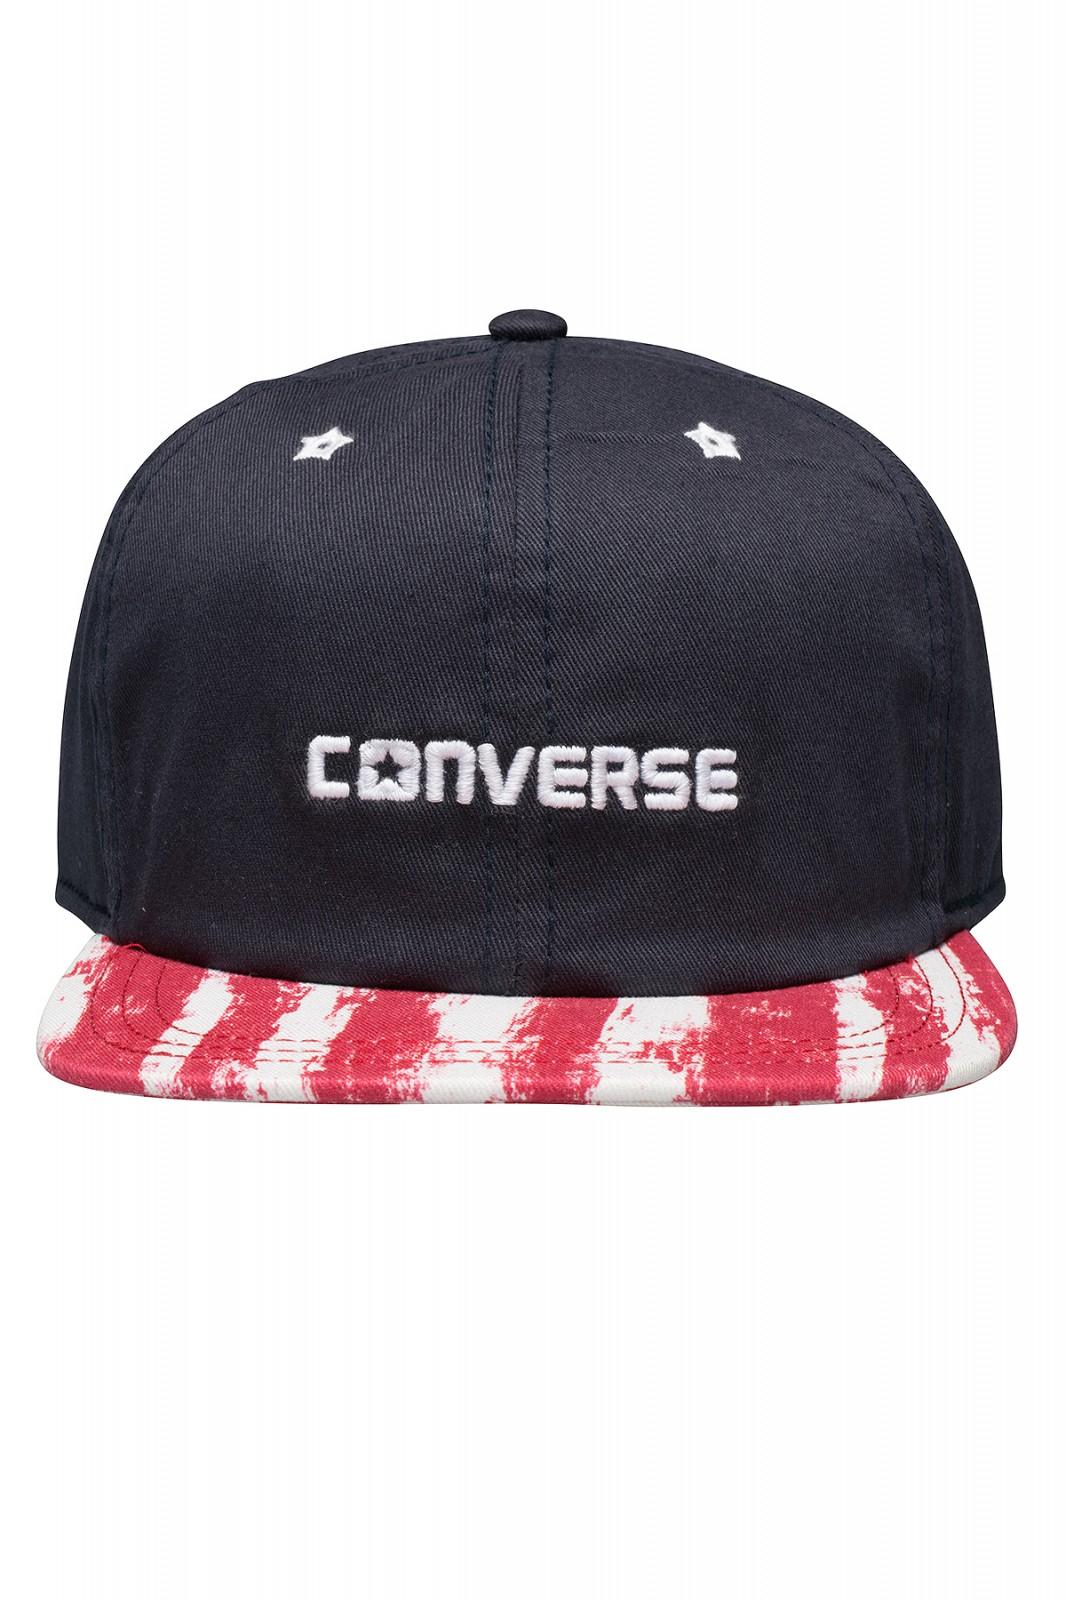 [Outlet46] Converse All Star Baseball Cap Basecap Blau CON038 inkl. VSK